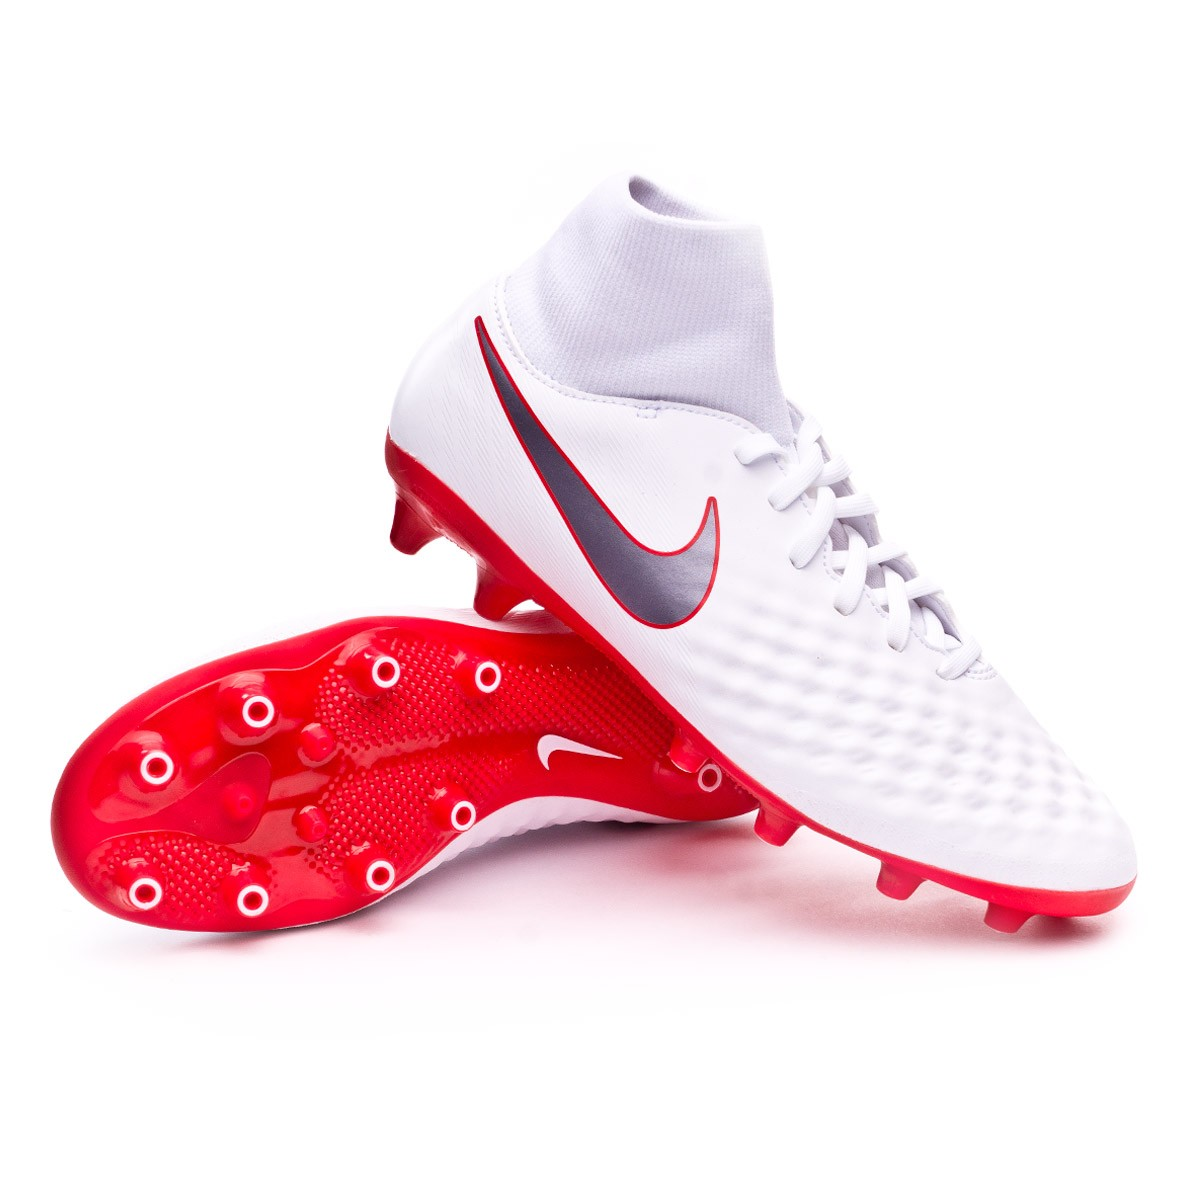 Nike Obra 2 Academy DF AG-Pro 41